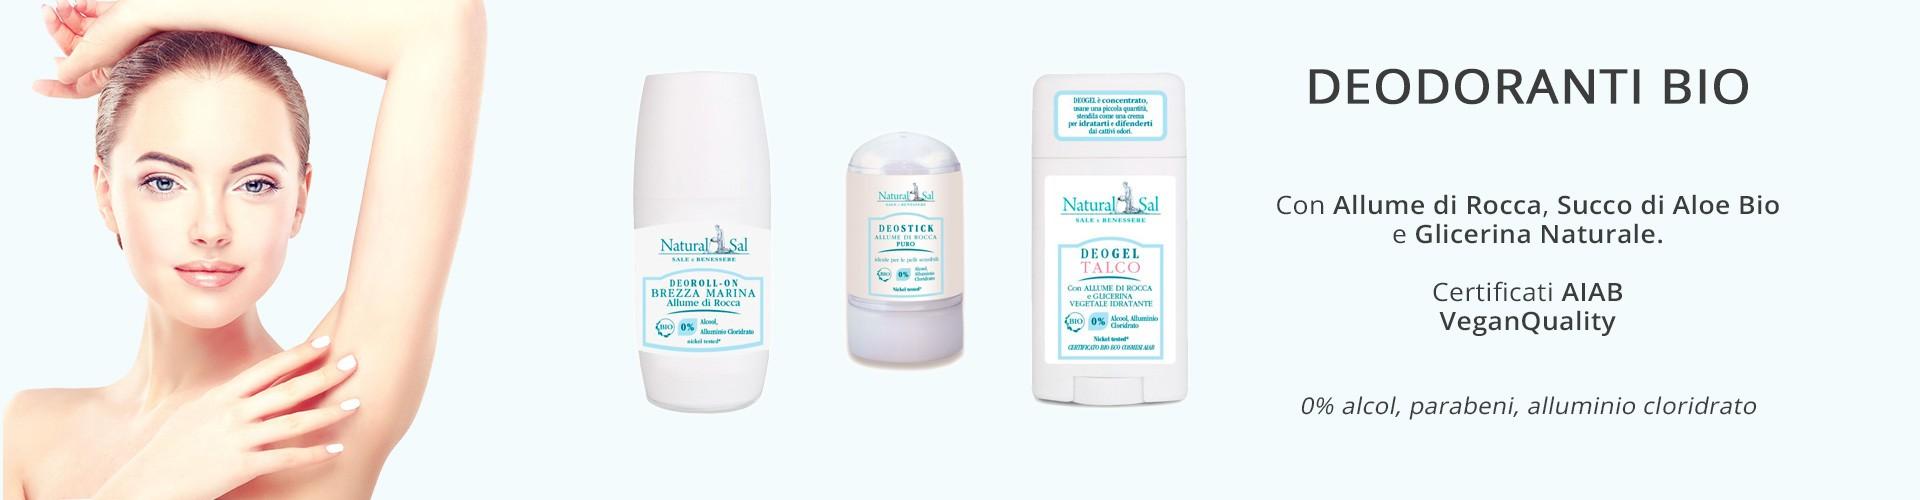 Deodoranti BIO 2019